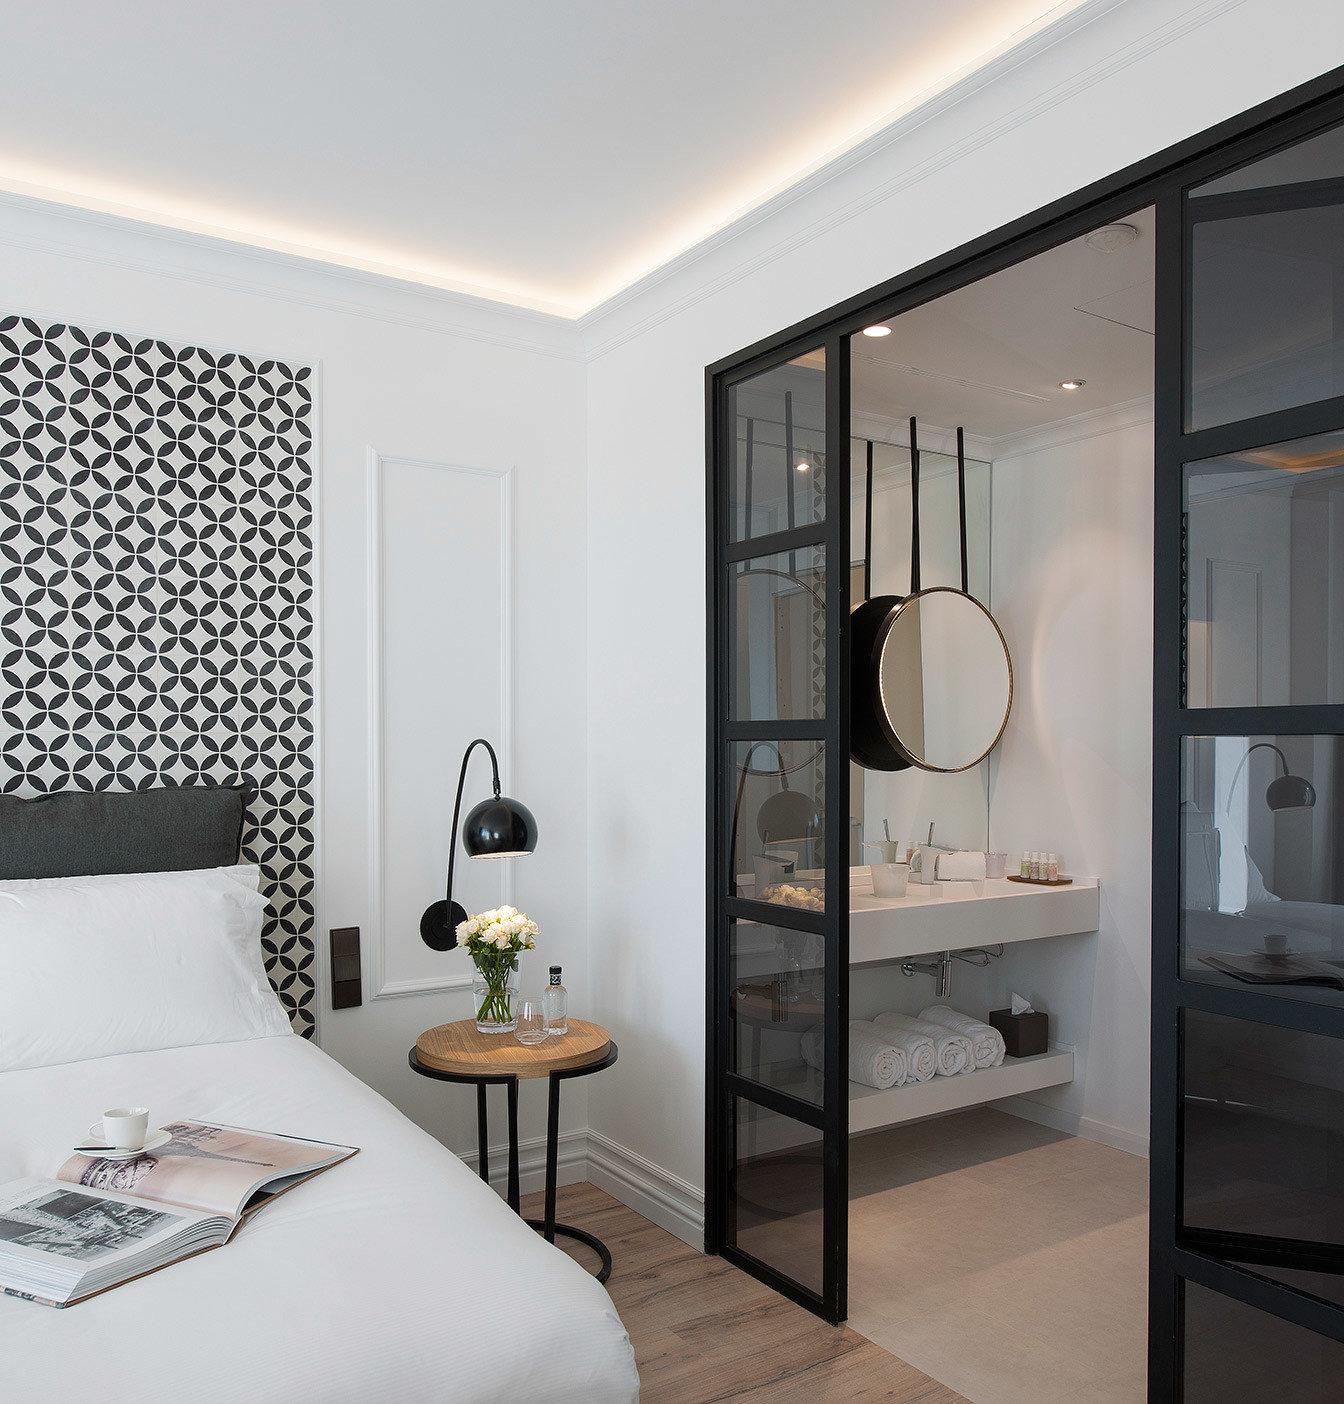 Boutique Hotels Hotels indoor wall bed room floor property interior design bathroom Bedroom home real estate Design Suite apartment decorated furniture